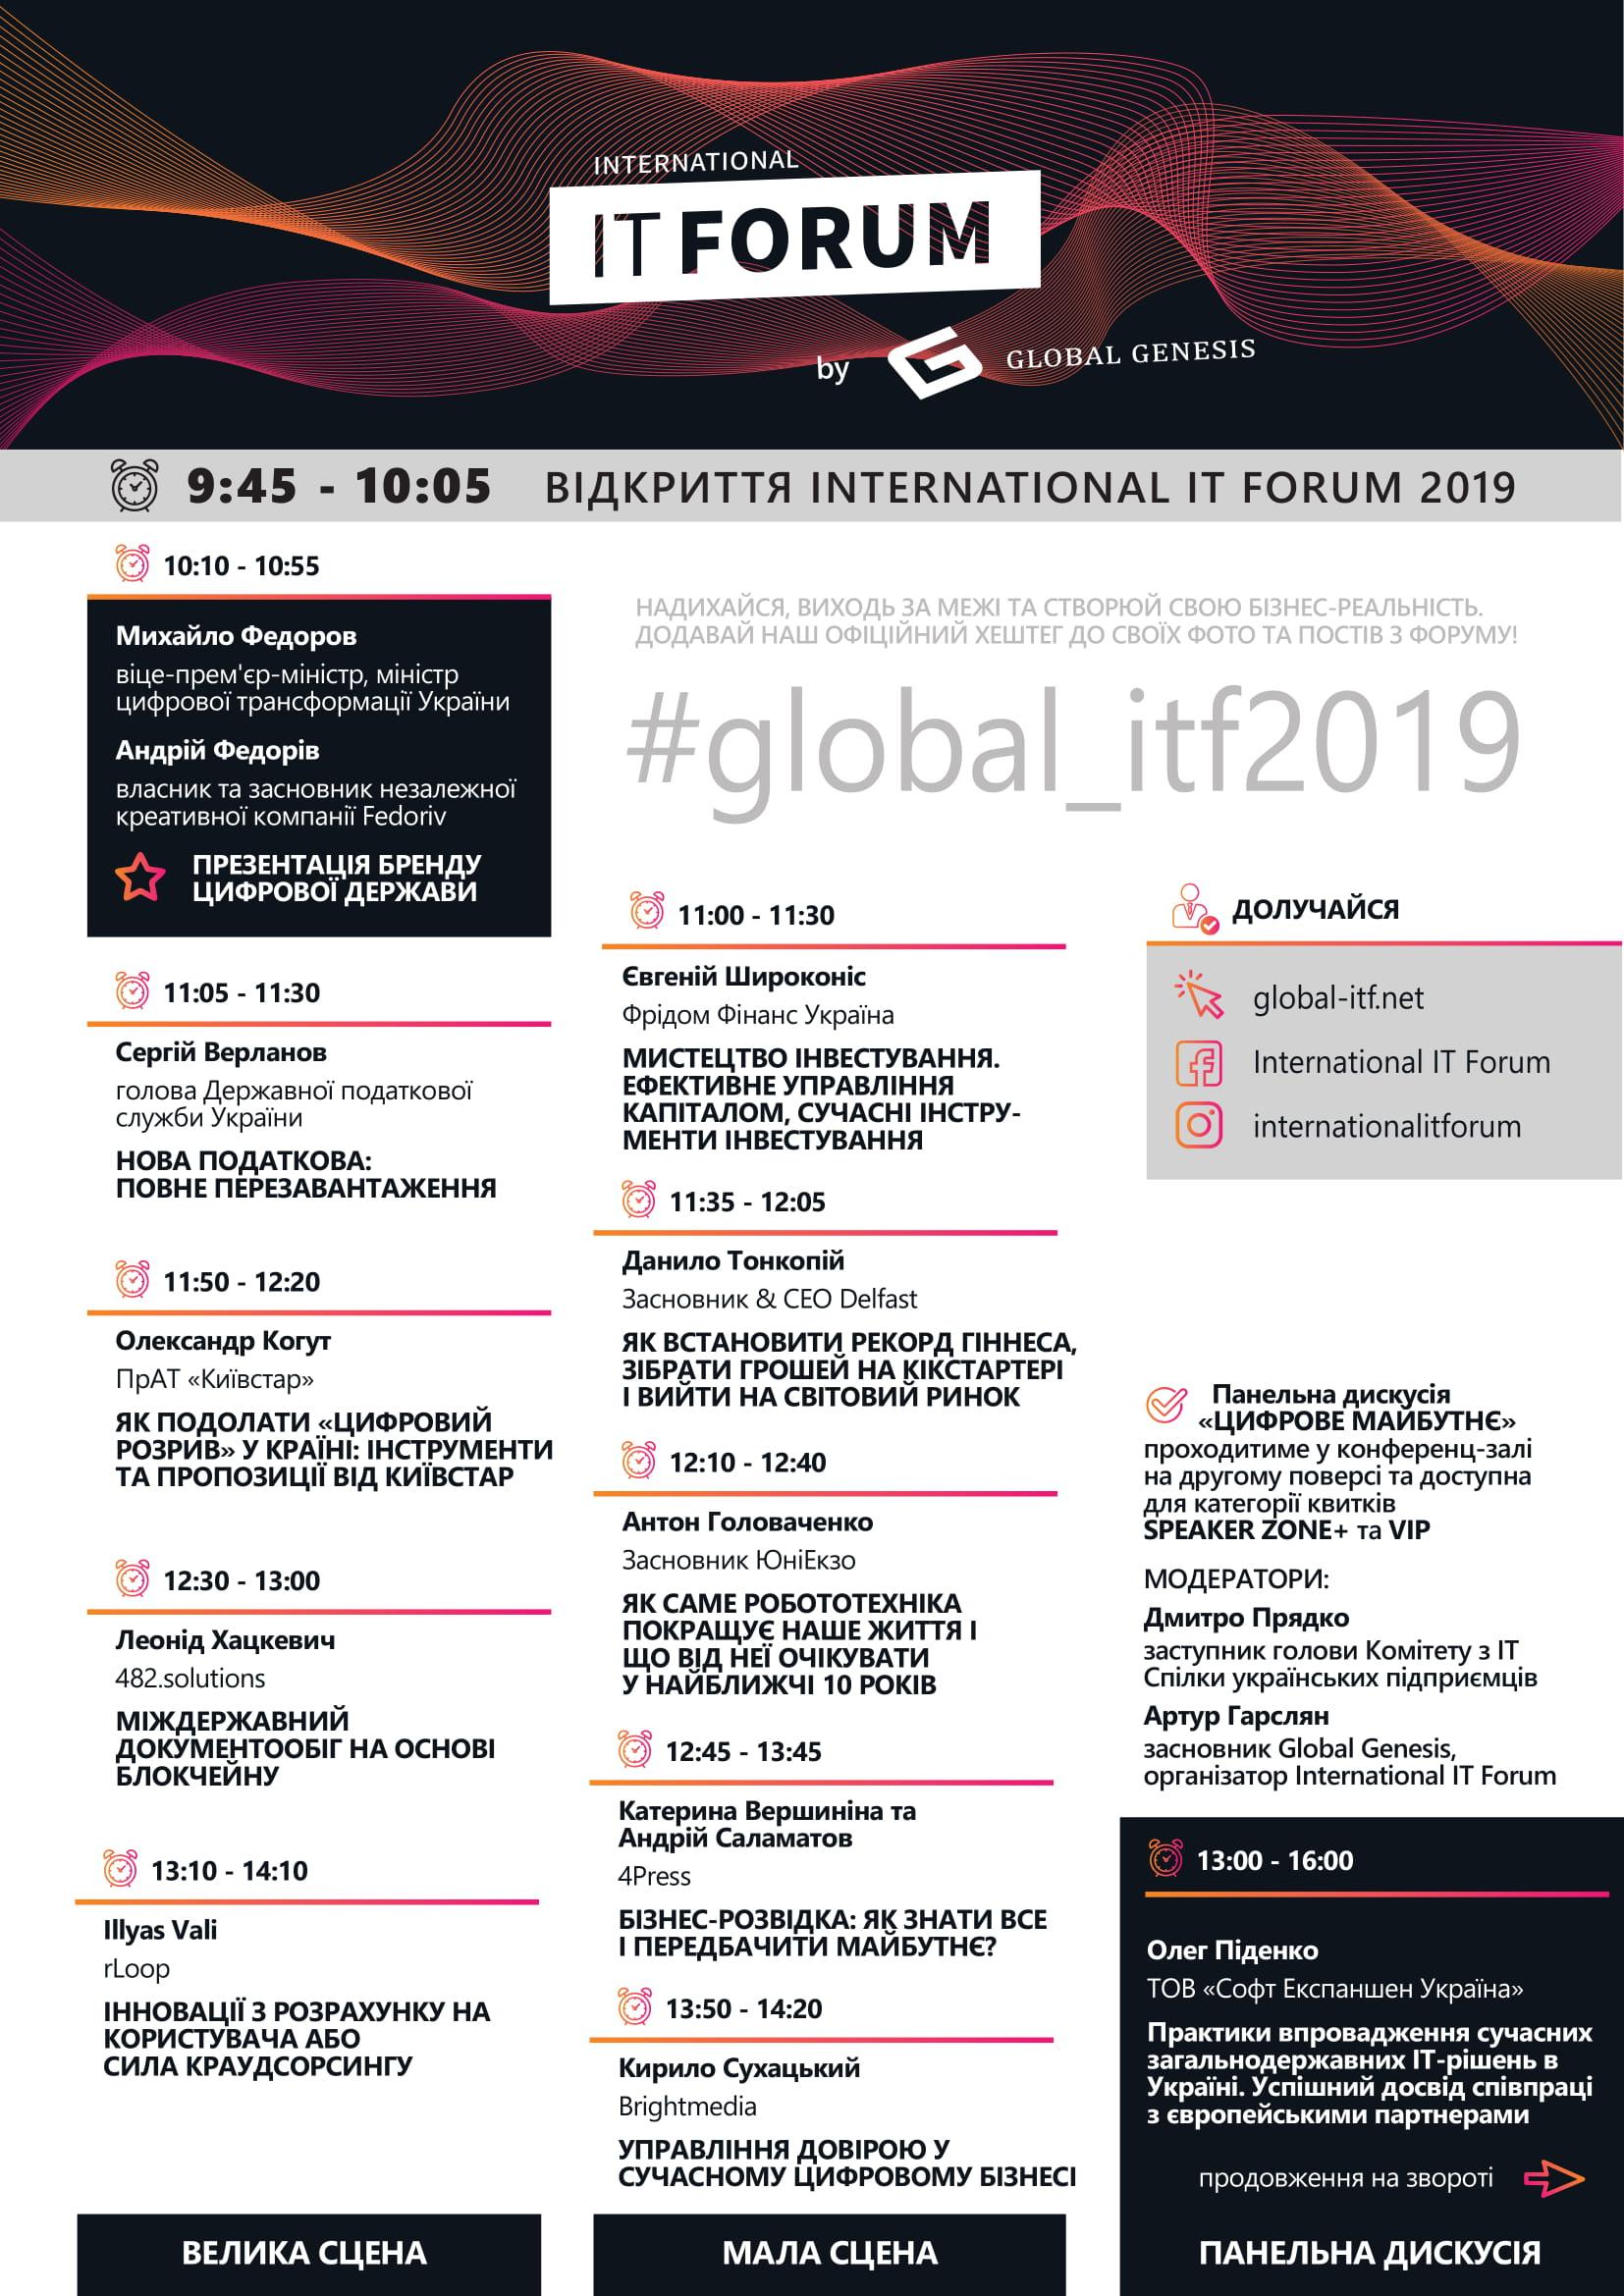 International IT Forum